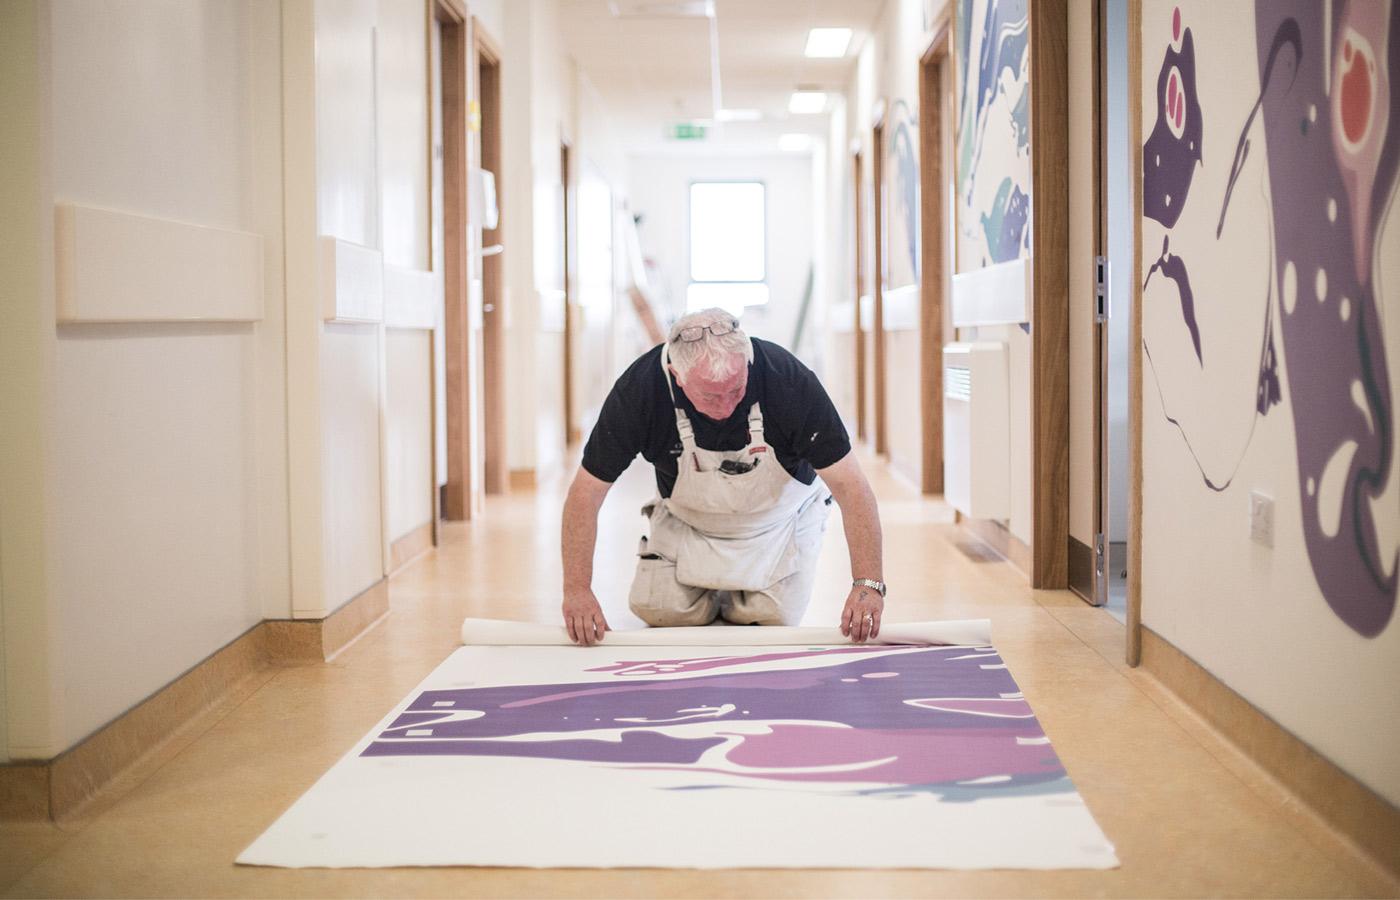 University Hospital Limerick graphic design print decorator installing design